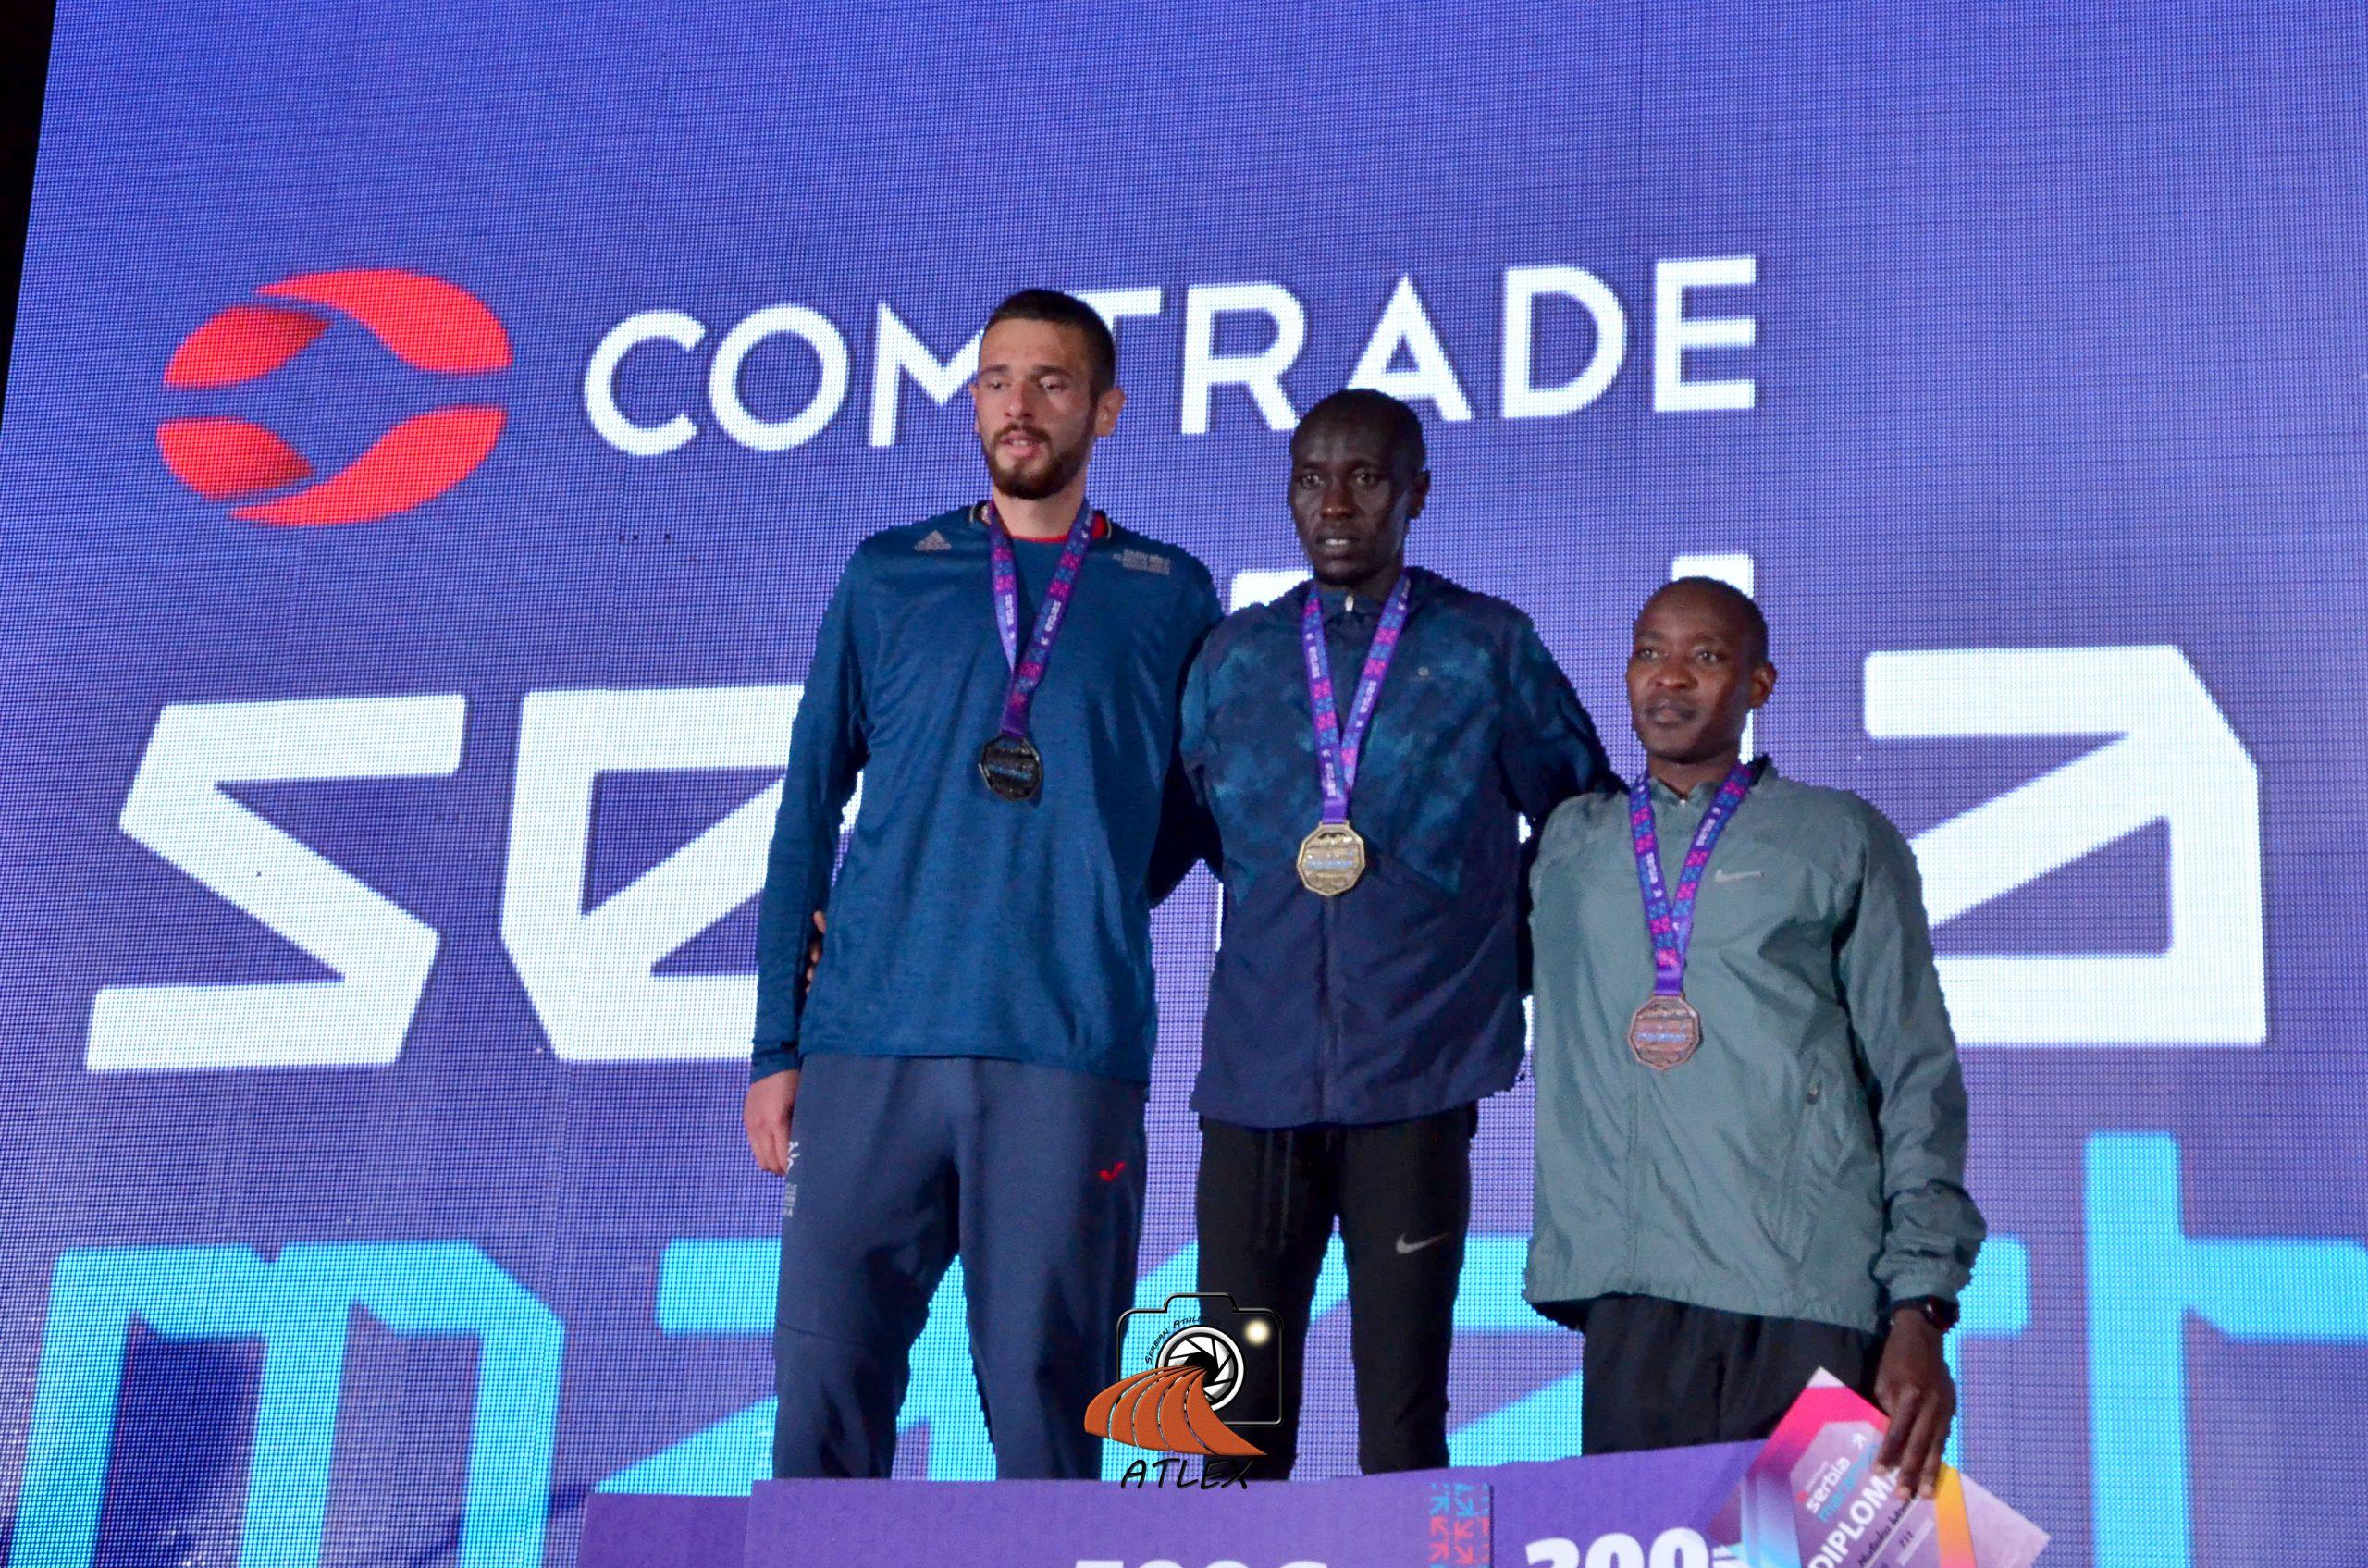 Prvi Comtrade Serbia Marathon, polumaraton - Mila Mitrović, Metju Kosgei, Elija Mutuku Wambua,